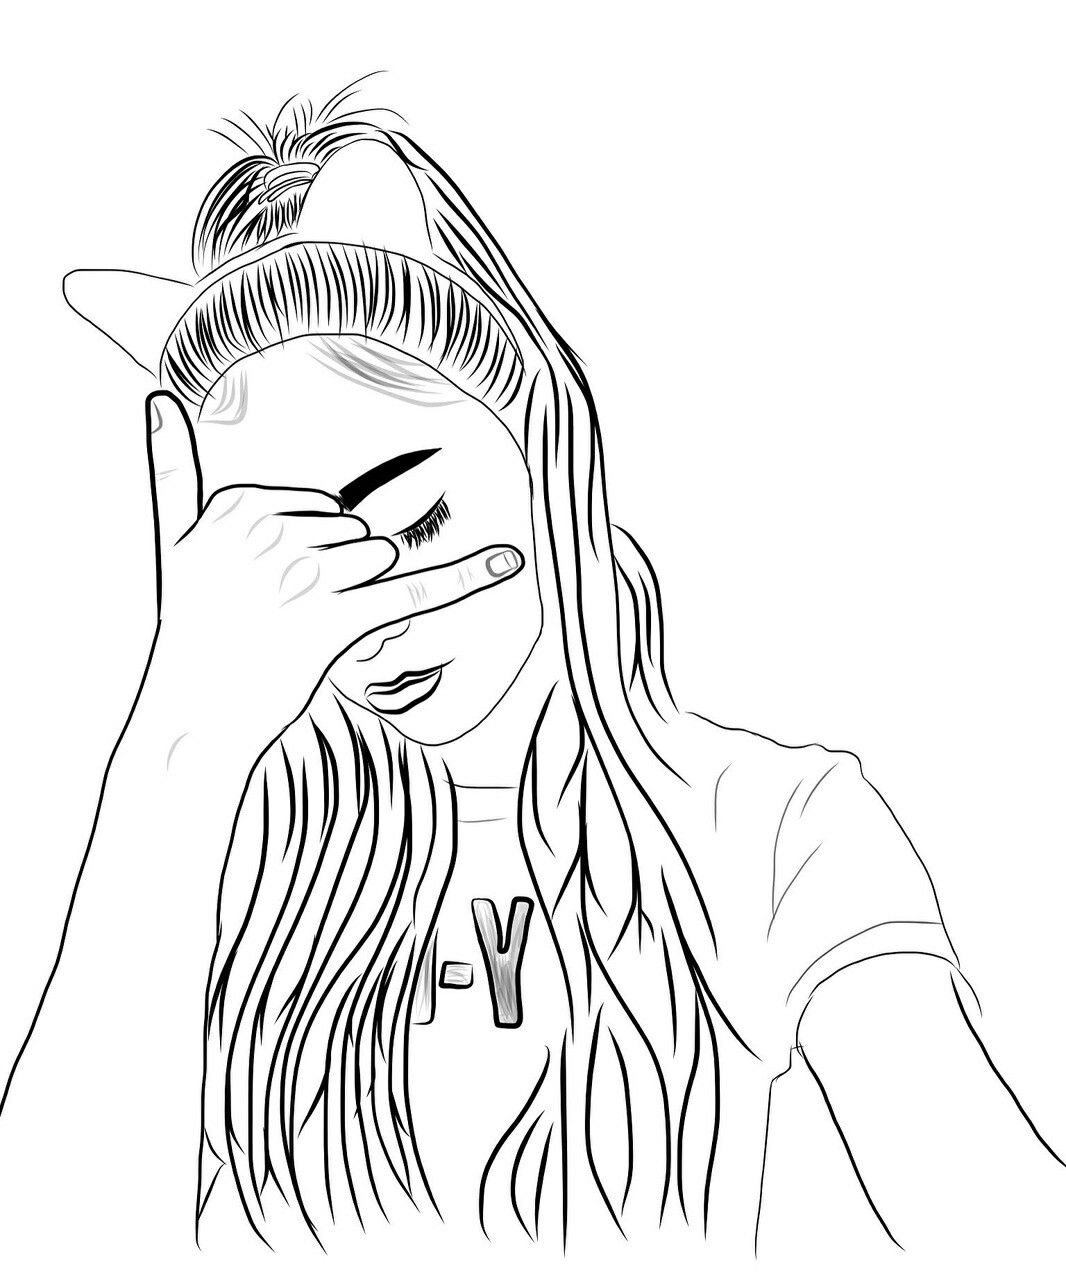 Pin de Aesthetics em outlines Menina tumblr desenho